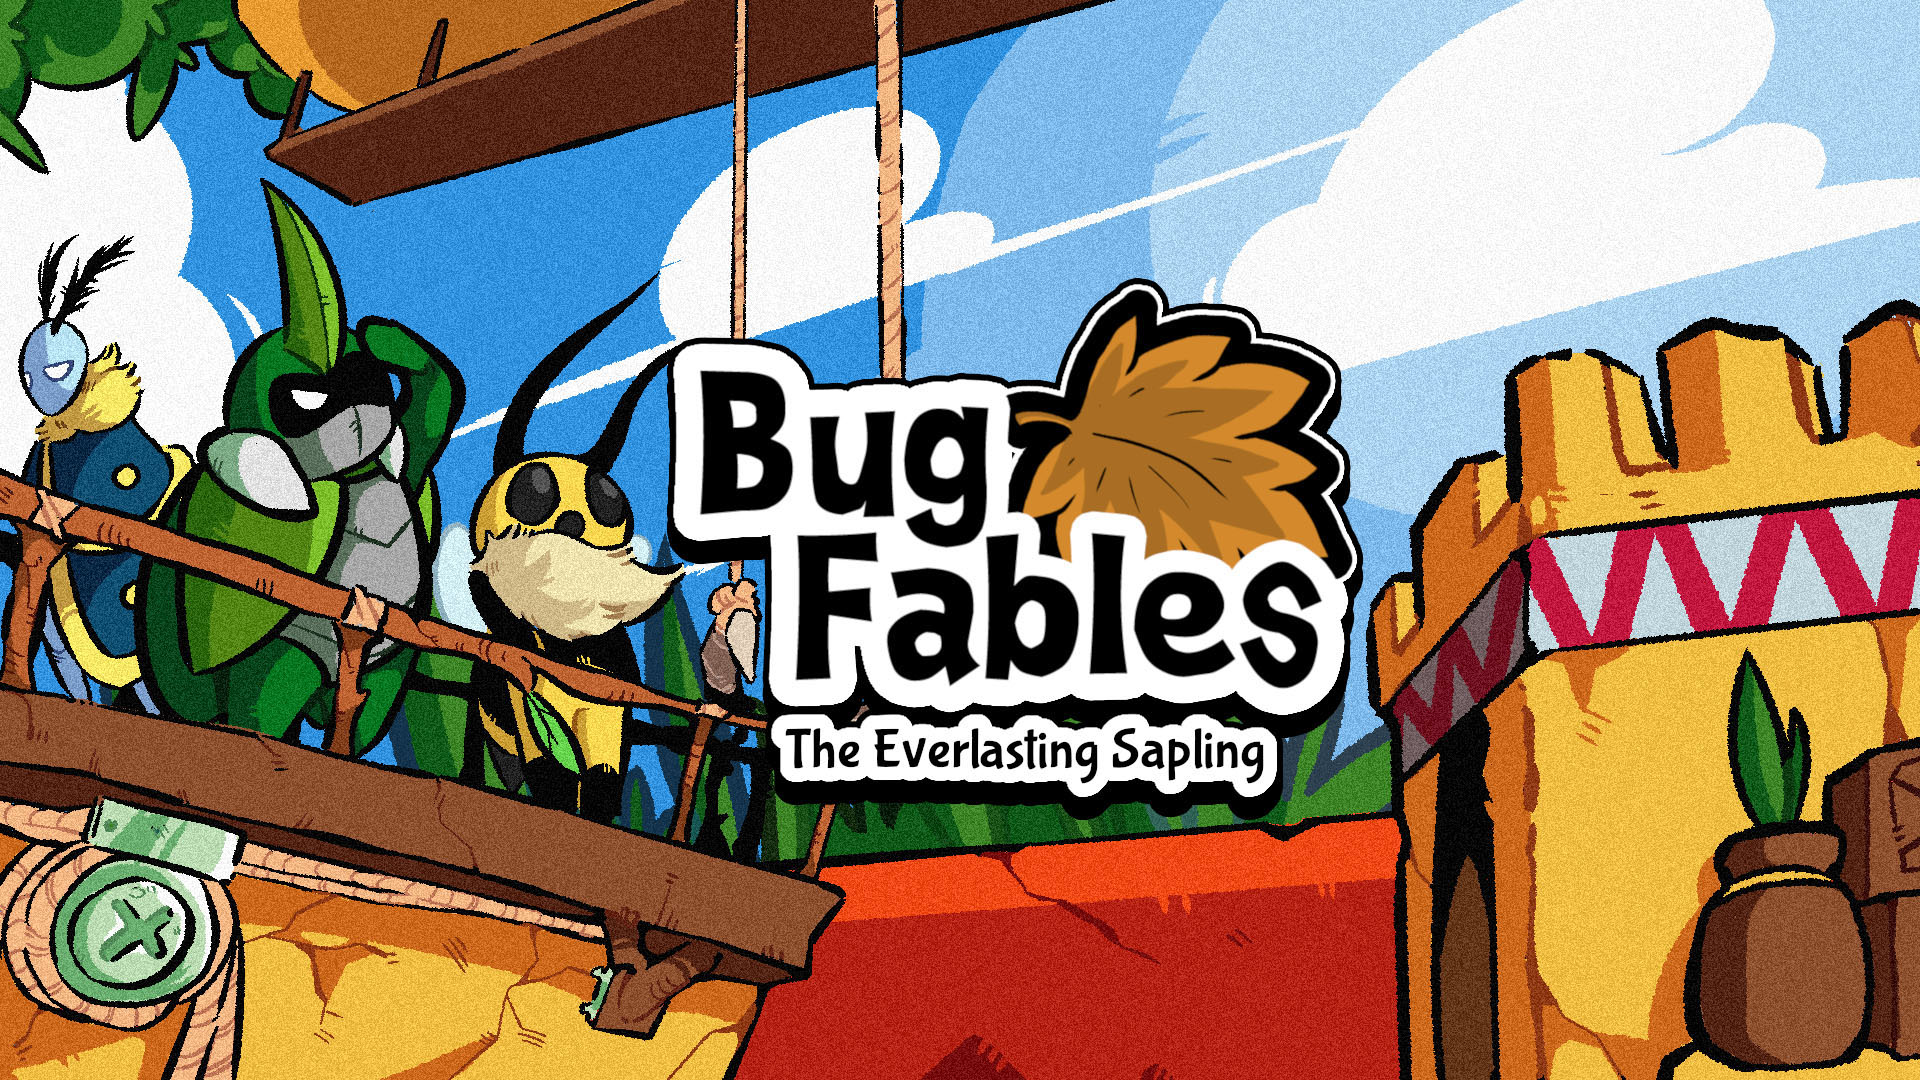 Bug Fables The Everlasting Sapling.jpg